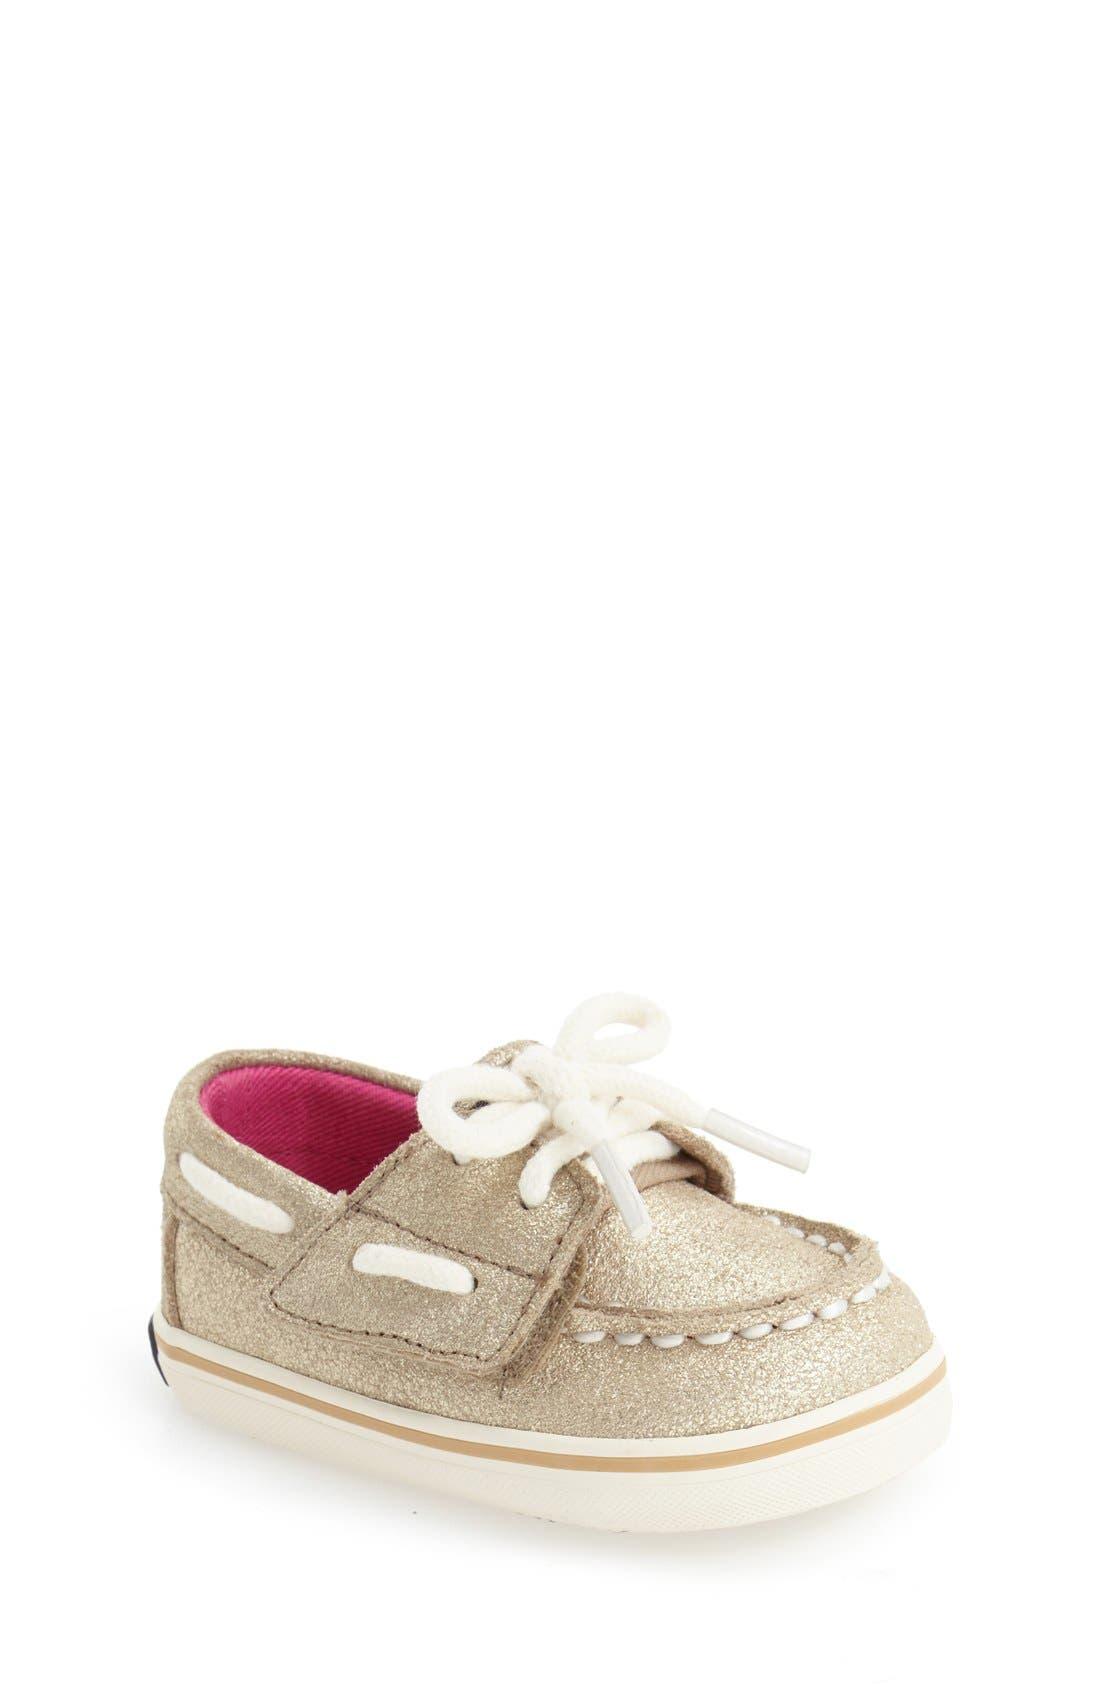 Alternate Image 1 Selected - Sperry Kids 'Bahama' Crib Shoe (Baby)